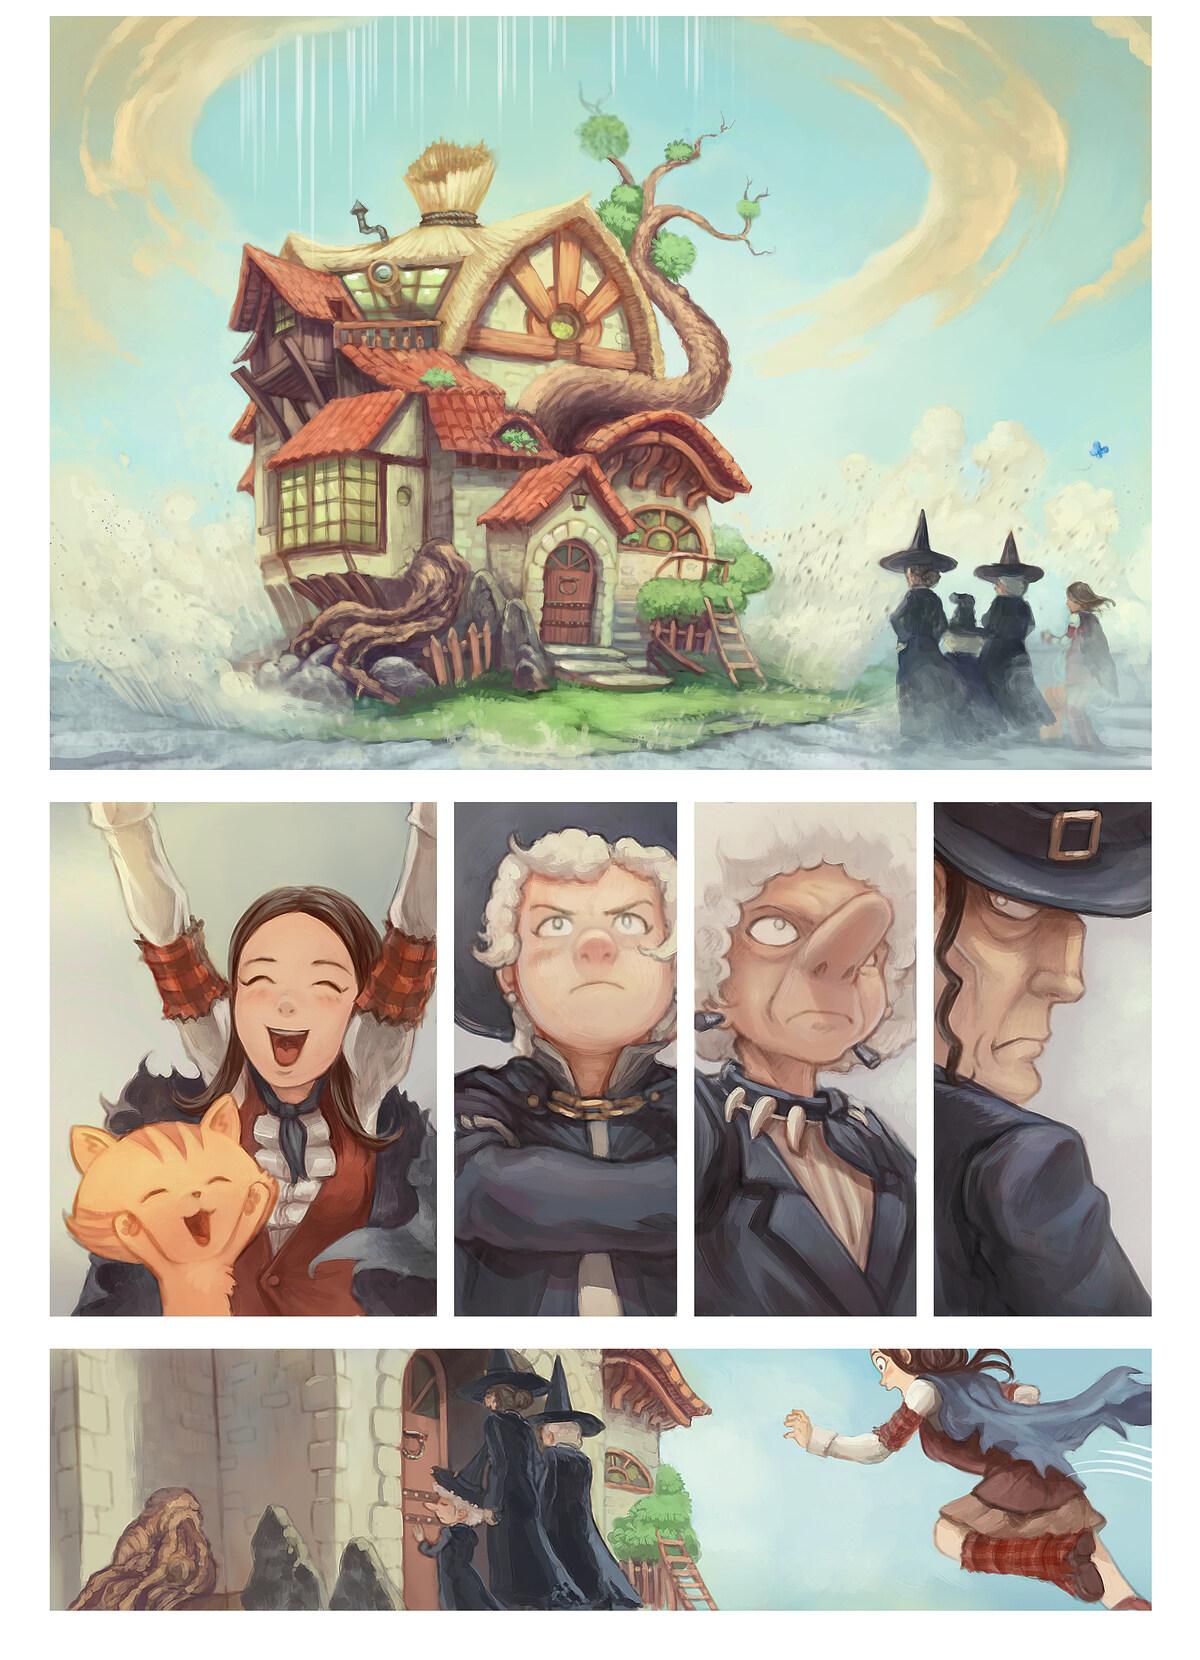 A webcomic page of Pepper&Carrot, épisode 25 [fr], page 8